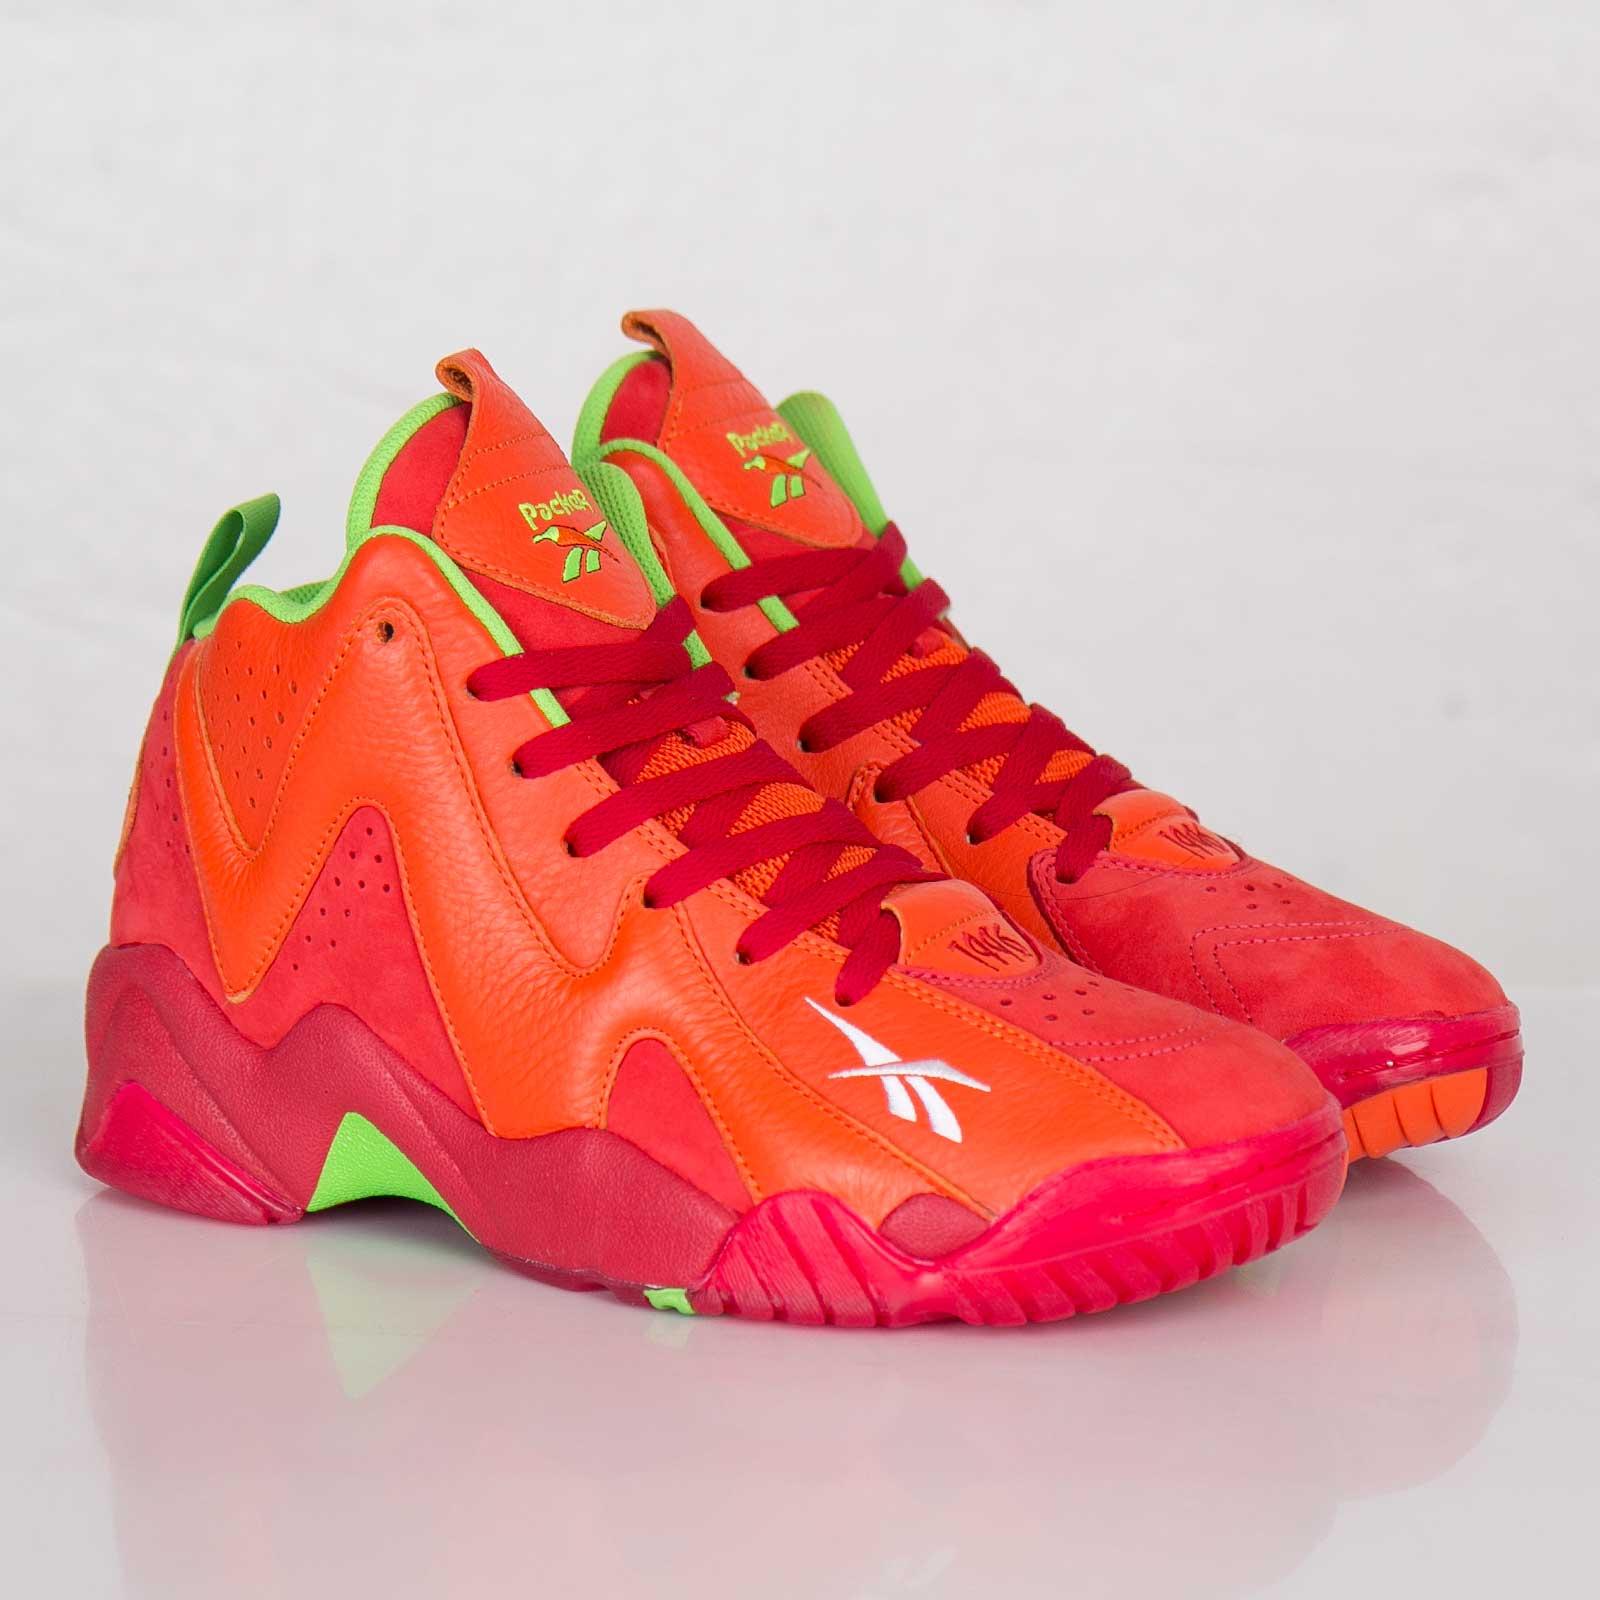 san francisco 37d39 bf365 Reebok Kamikaze II Mid - V53622 - Sneakersnstuff   sneakers ...